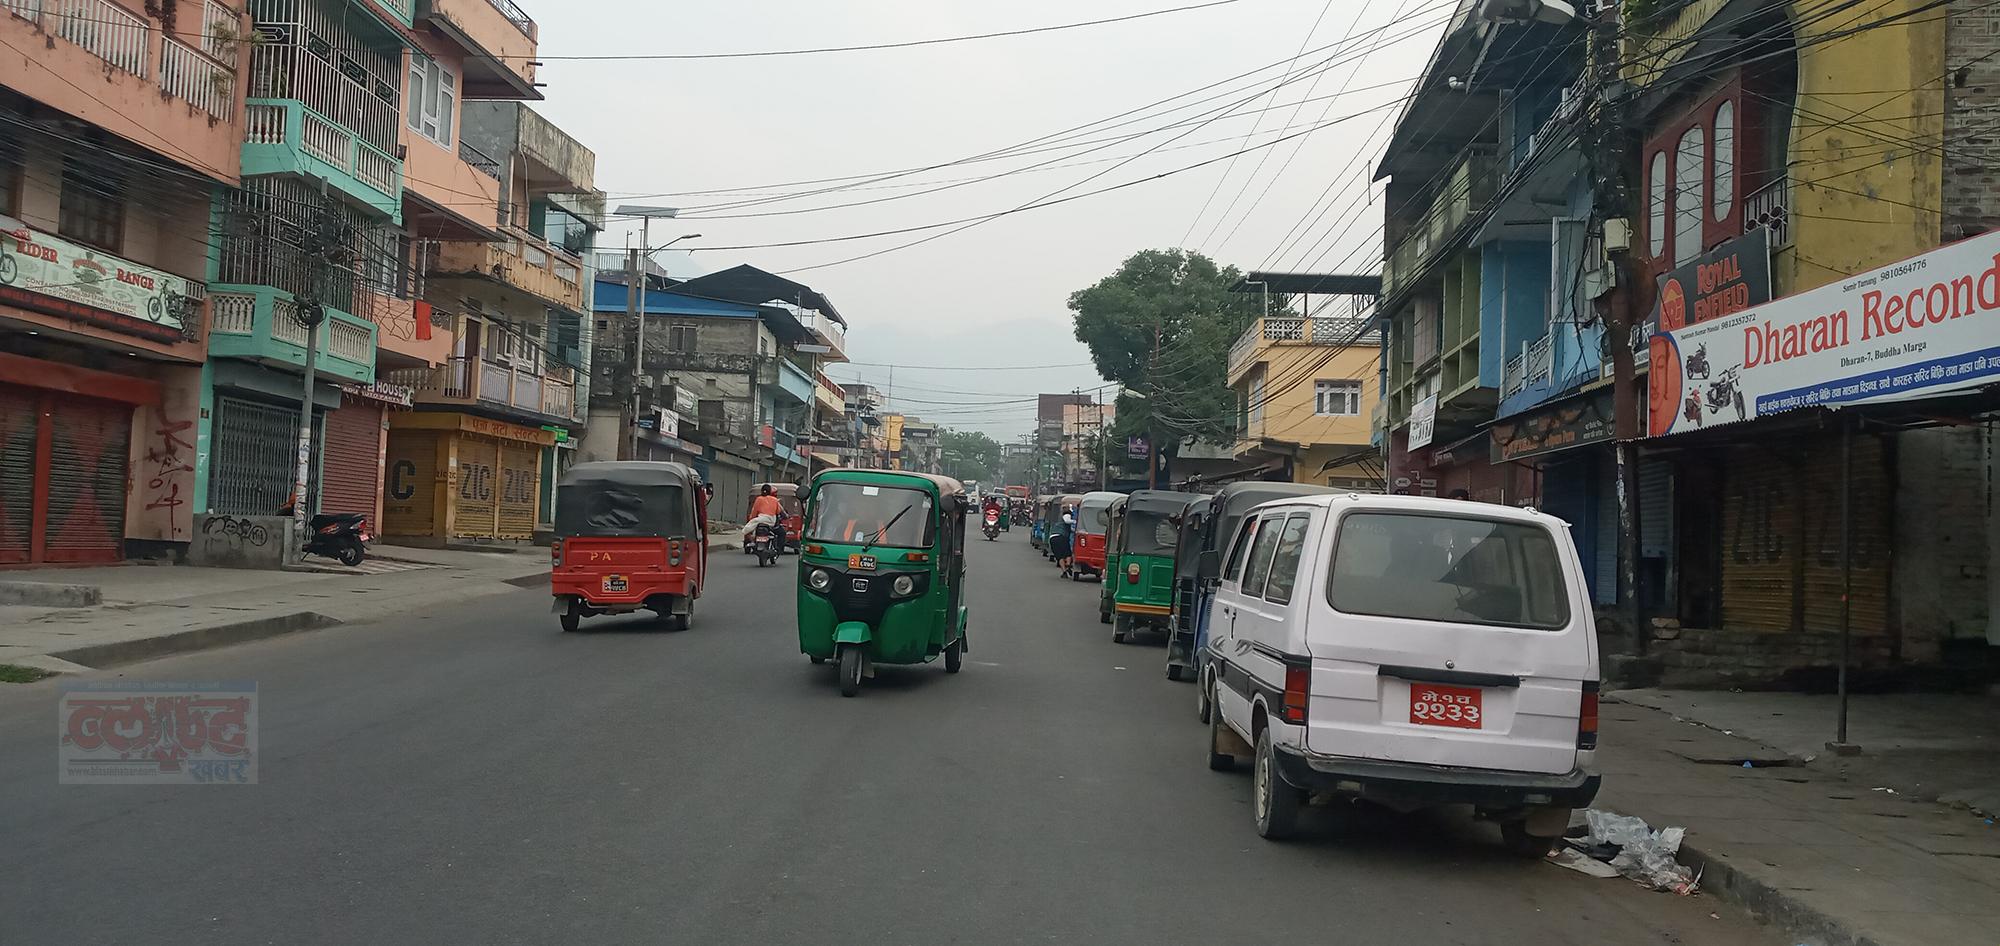 Dharan-Petrol_Pump12